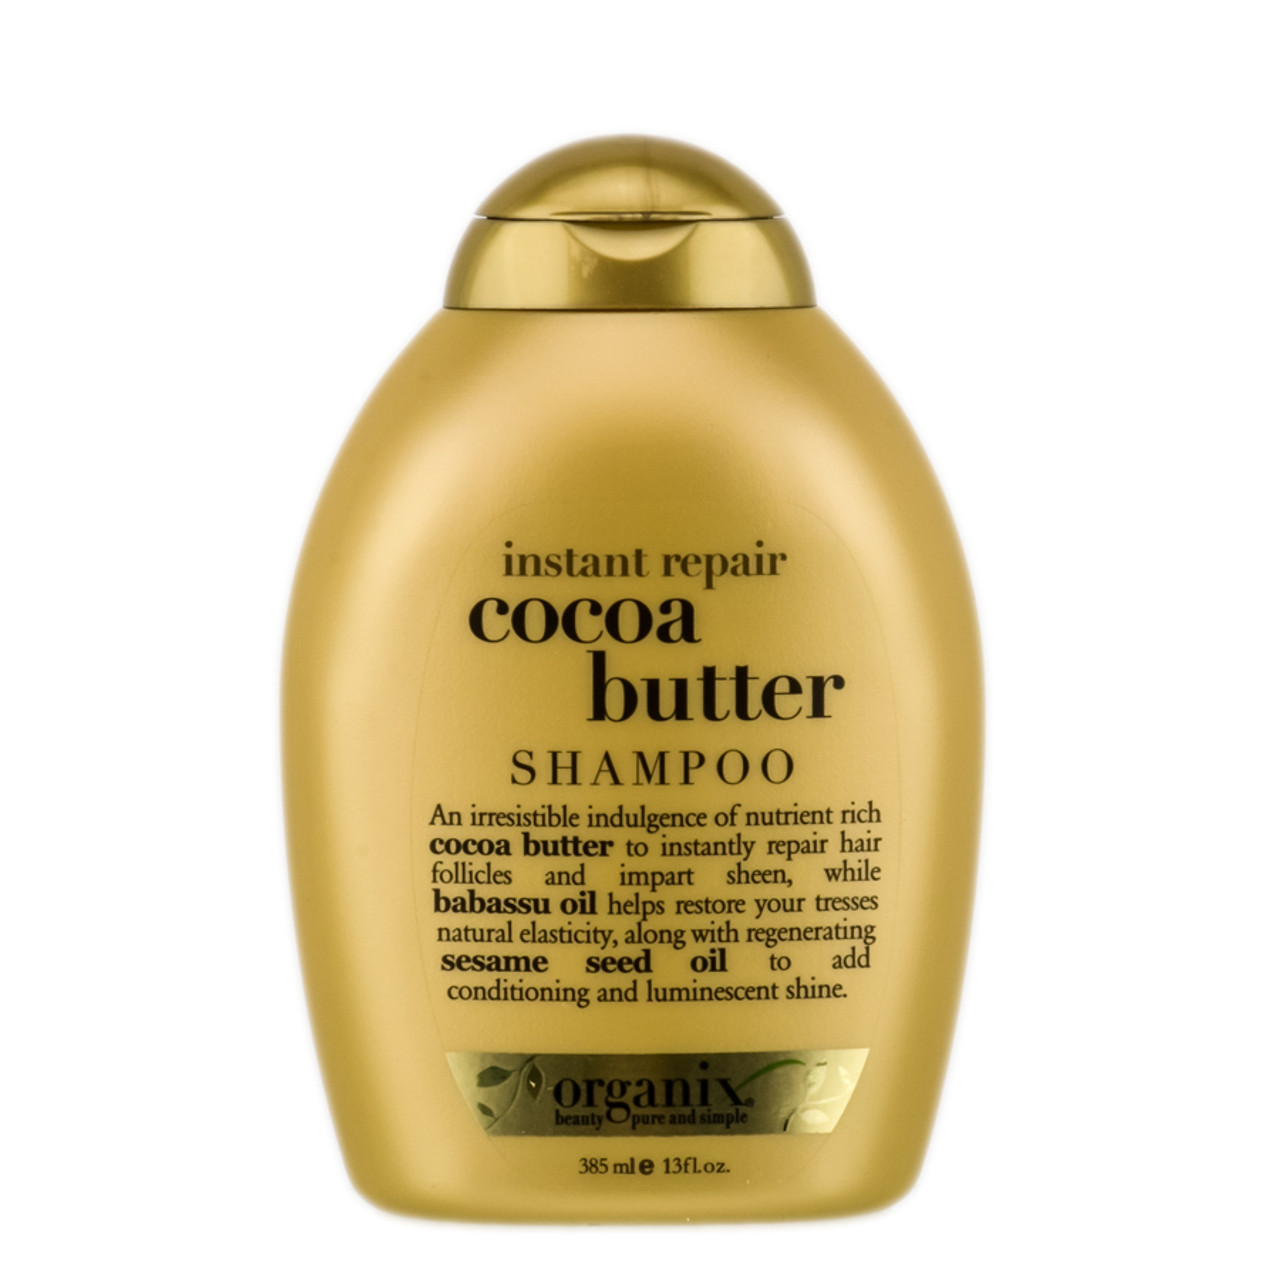 Organix cocoa butter shampoo